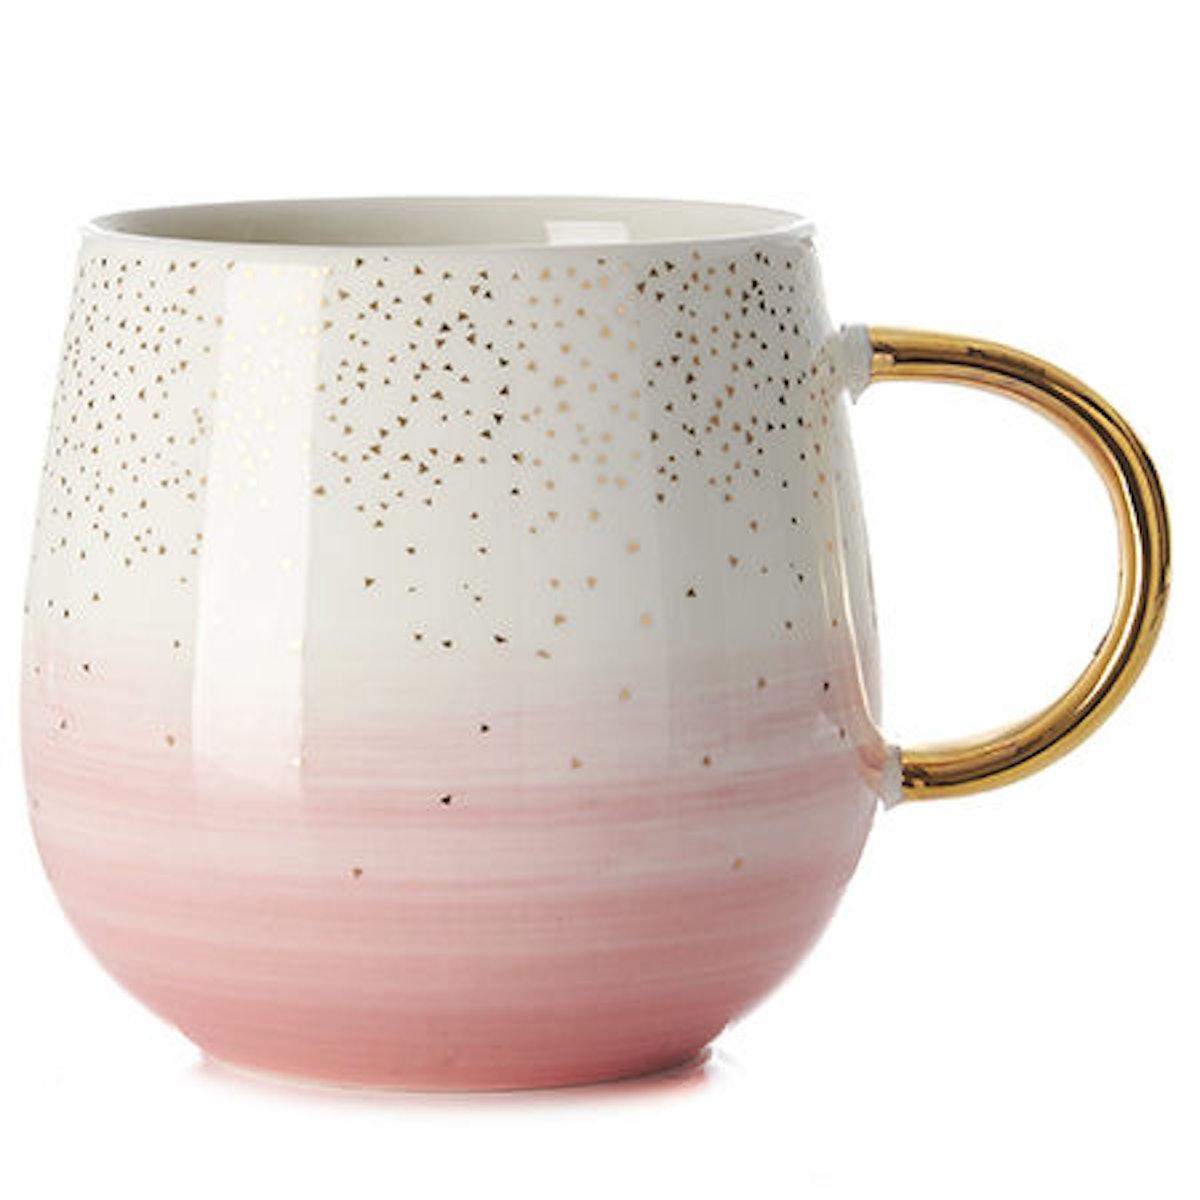 DAVIDsTEA Rose Sparkling Raindrop Mug